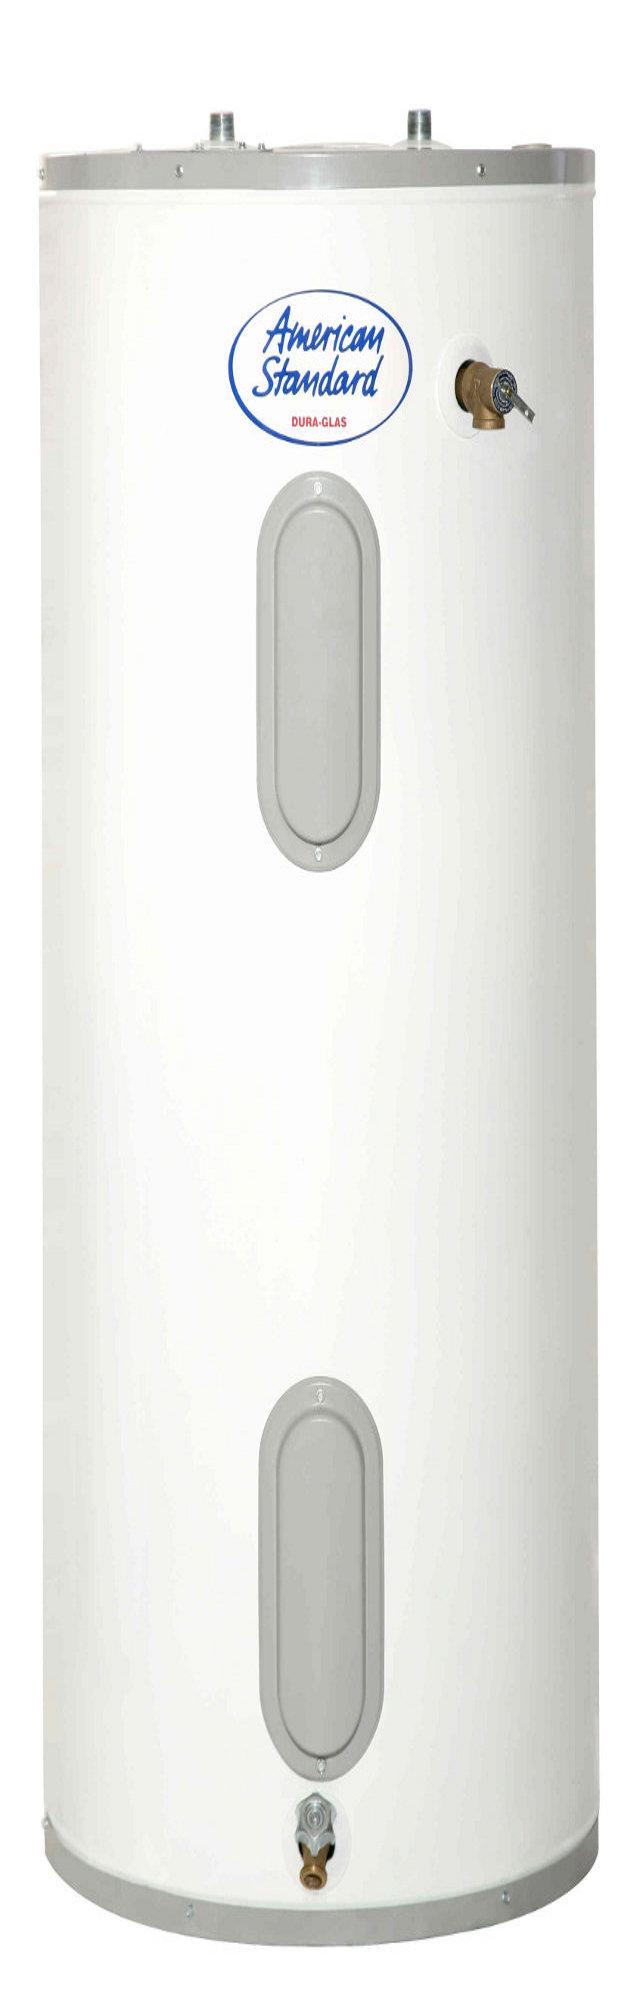 Electric Water Heater 40 Gallon American Standard Ocap Supply Web Store